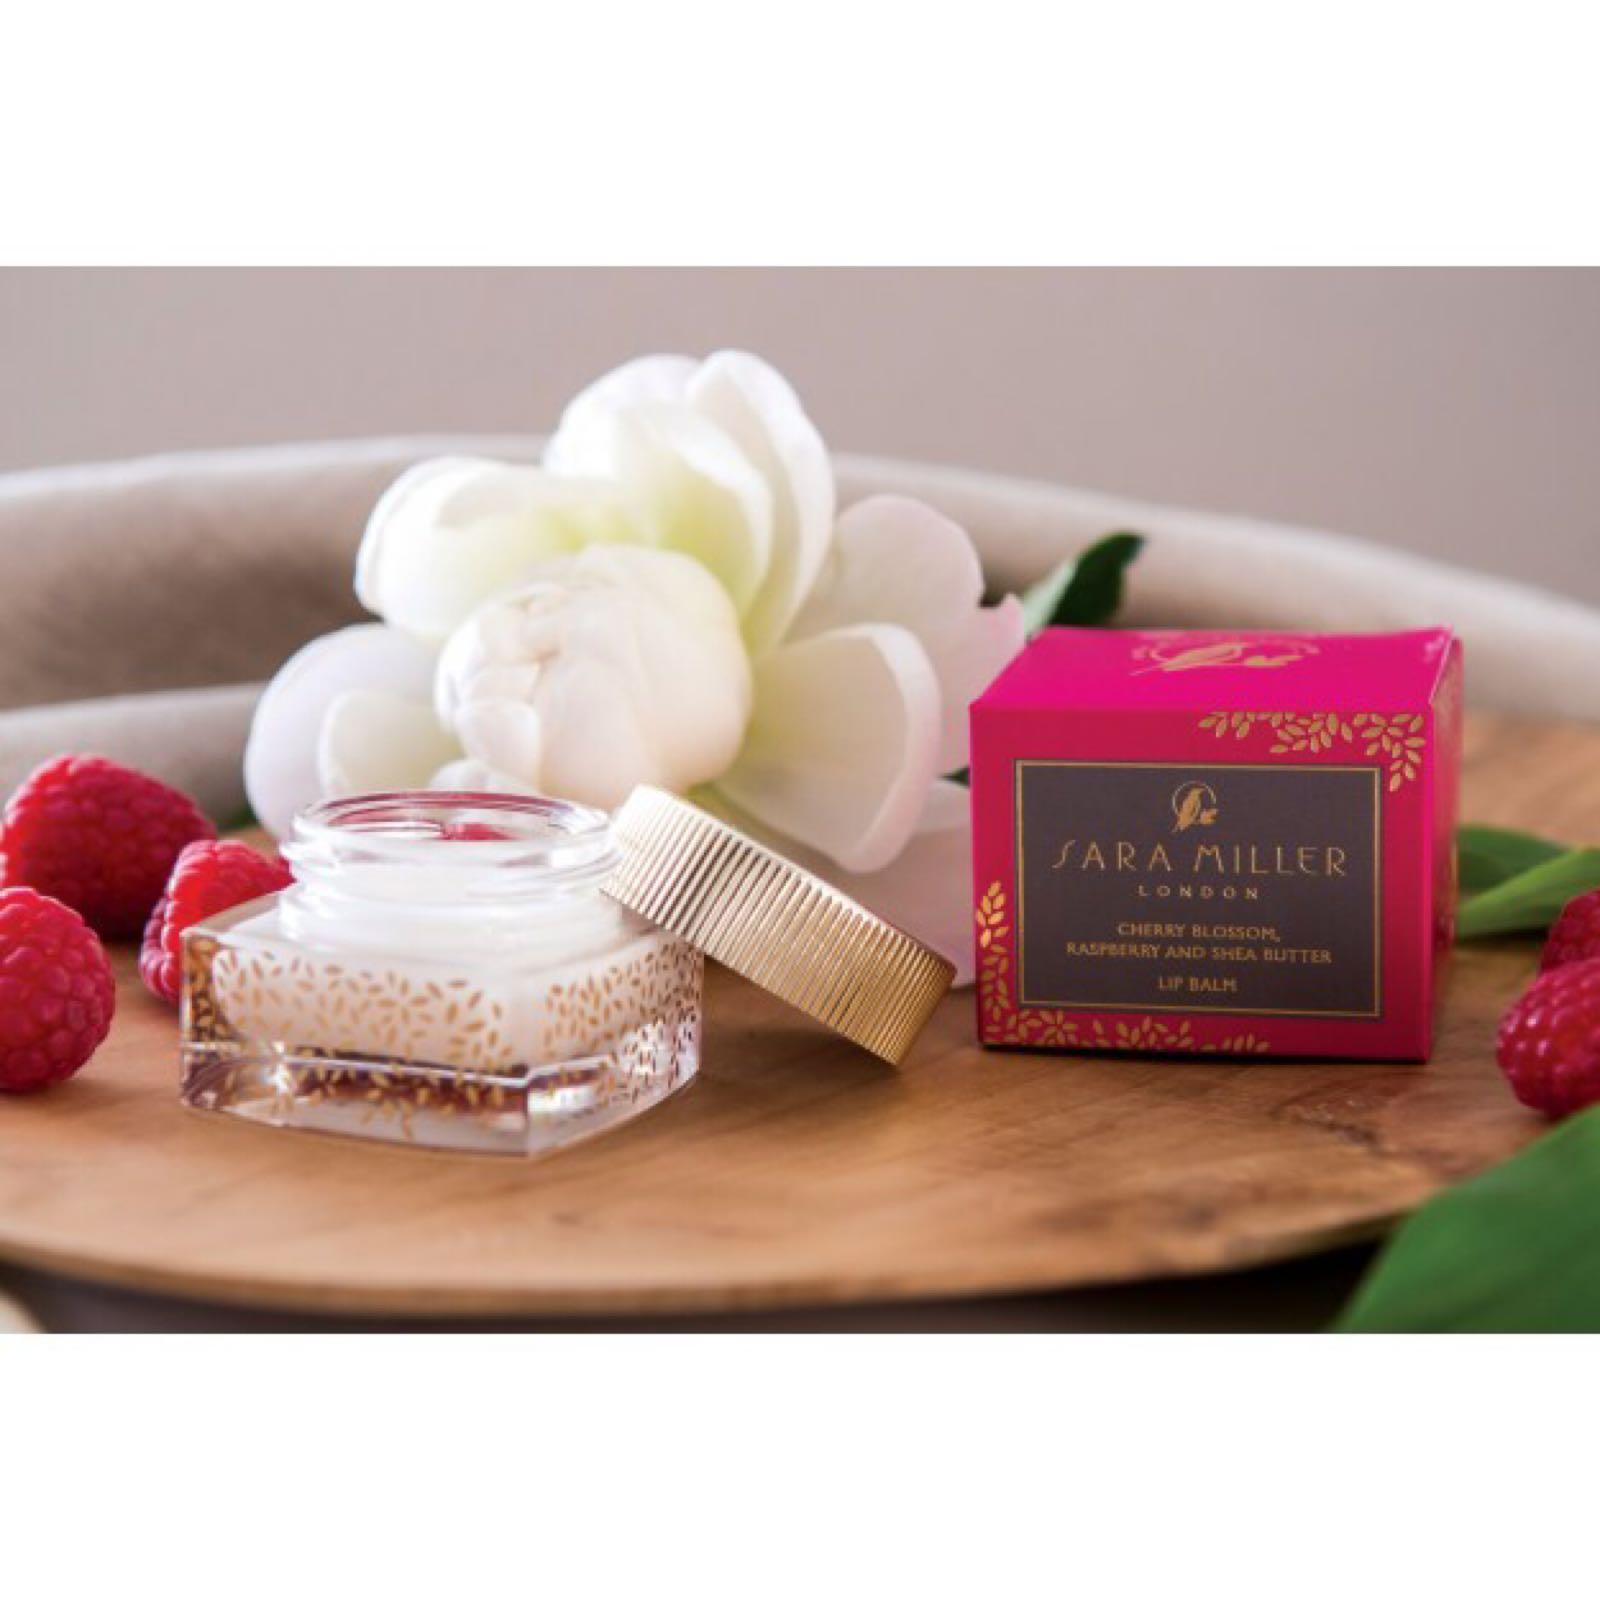 Sara Miller London Cherry blossom and Raspberry butter lip balm